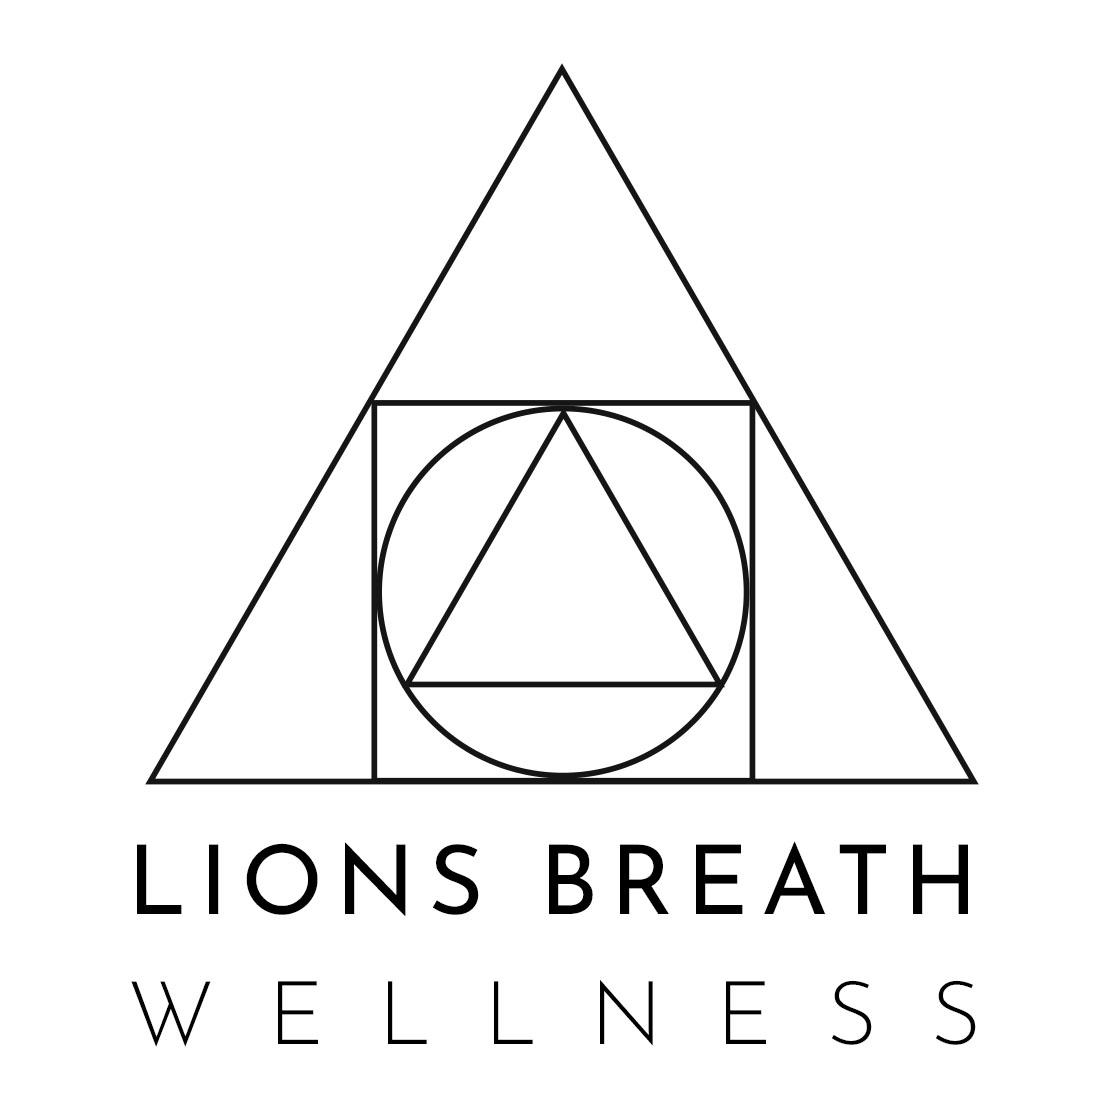 Lions Breath Wellness